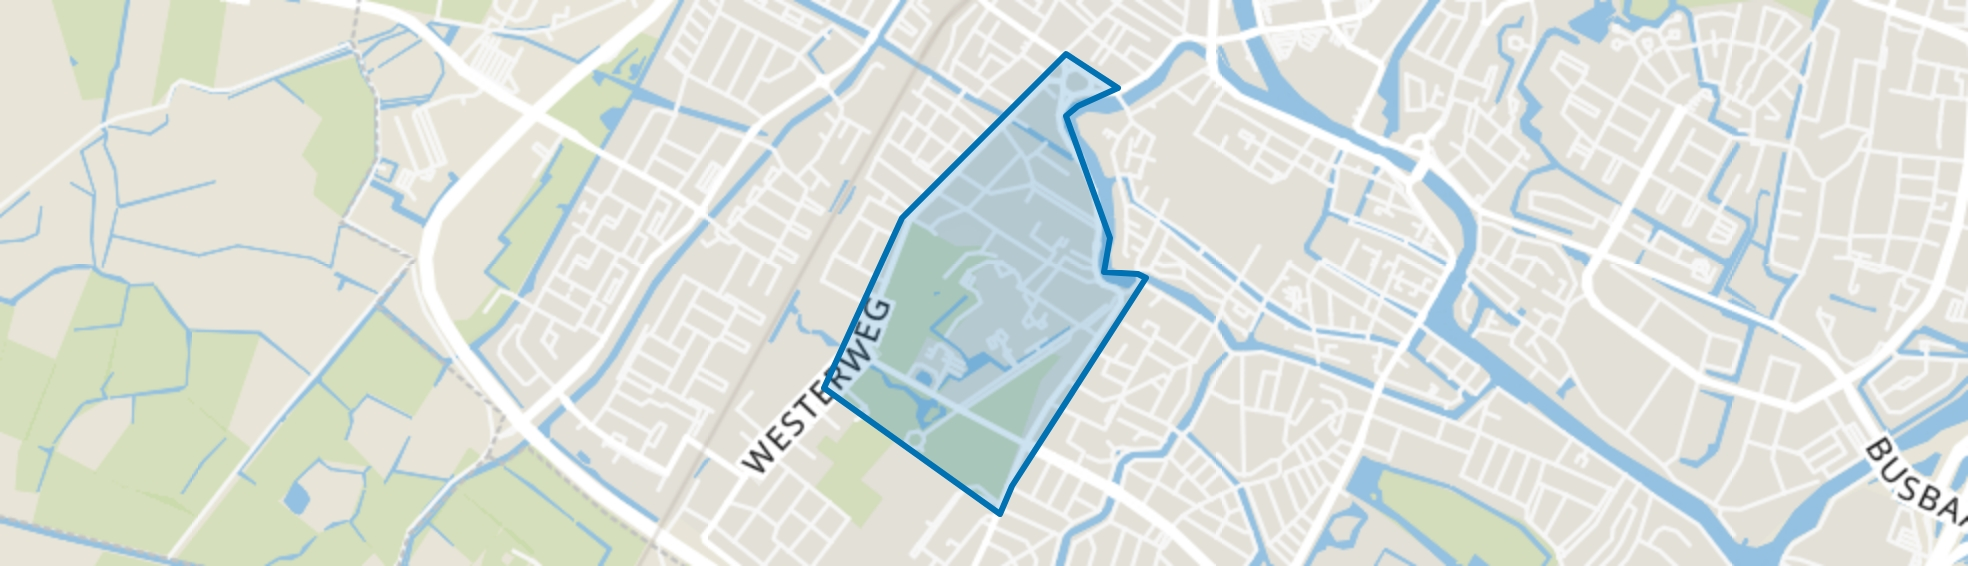 Nassaukwartier en Hout, Alkmaar map